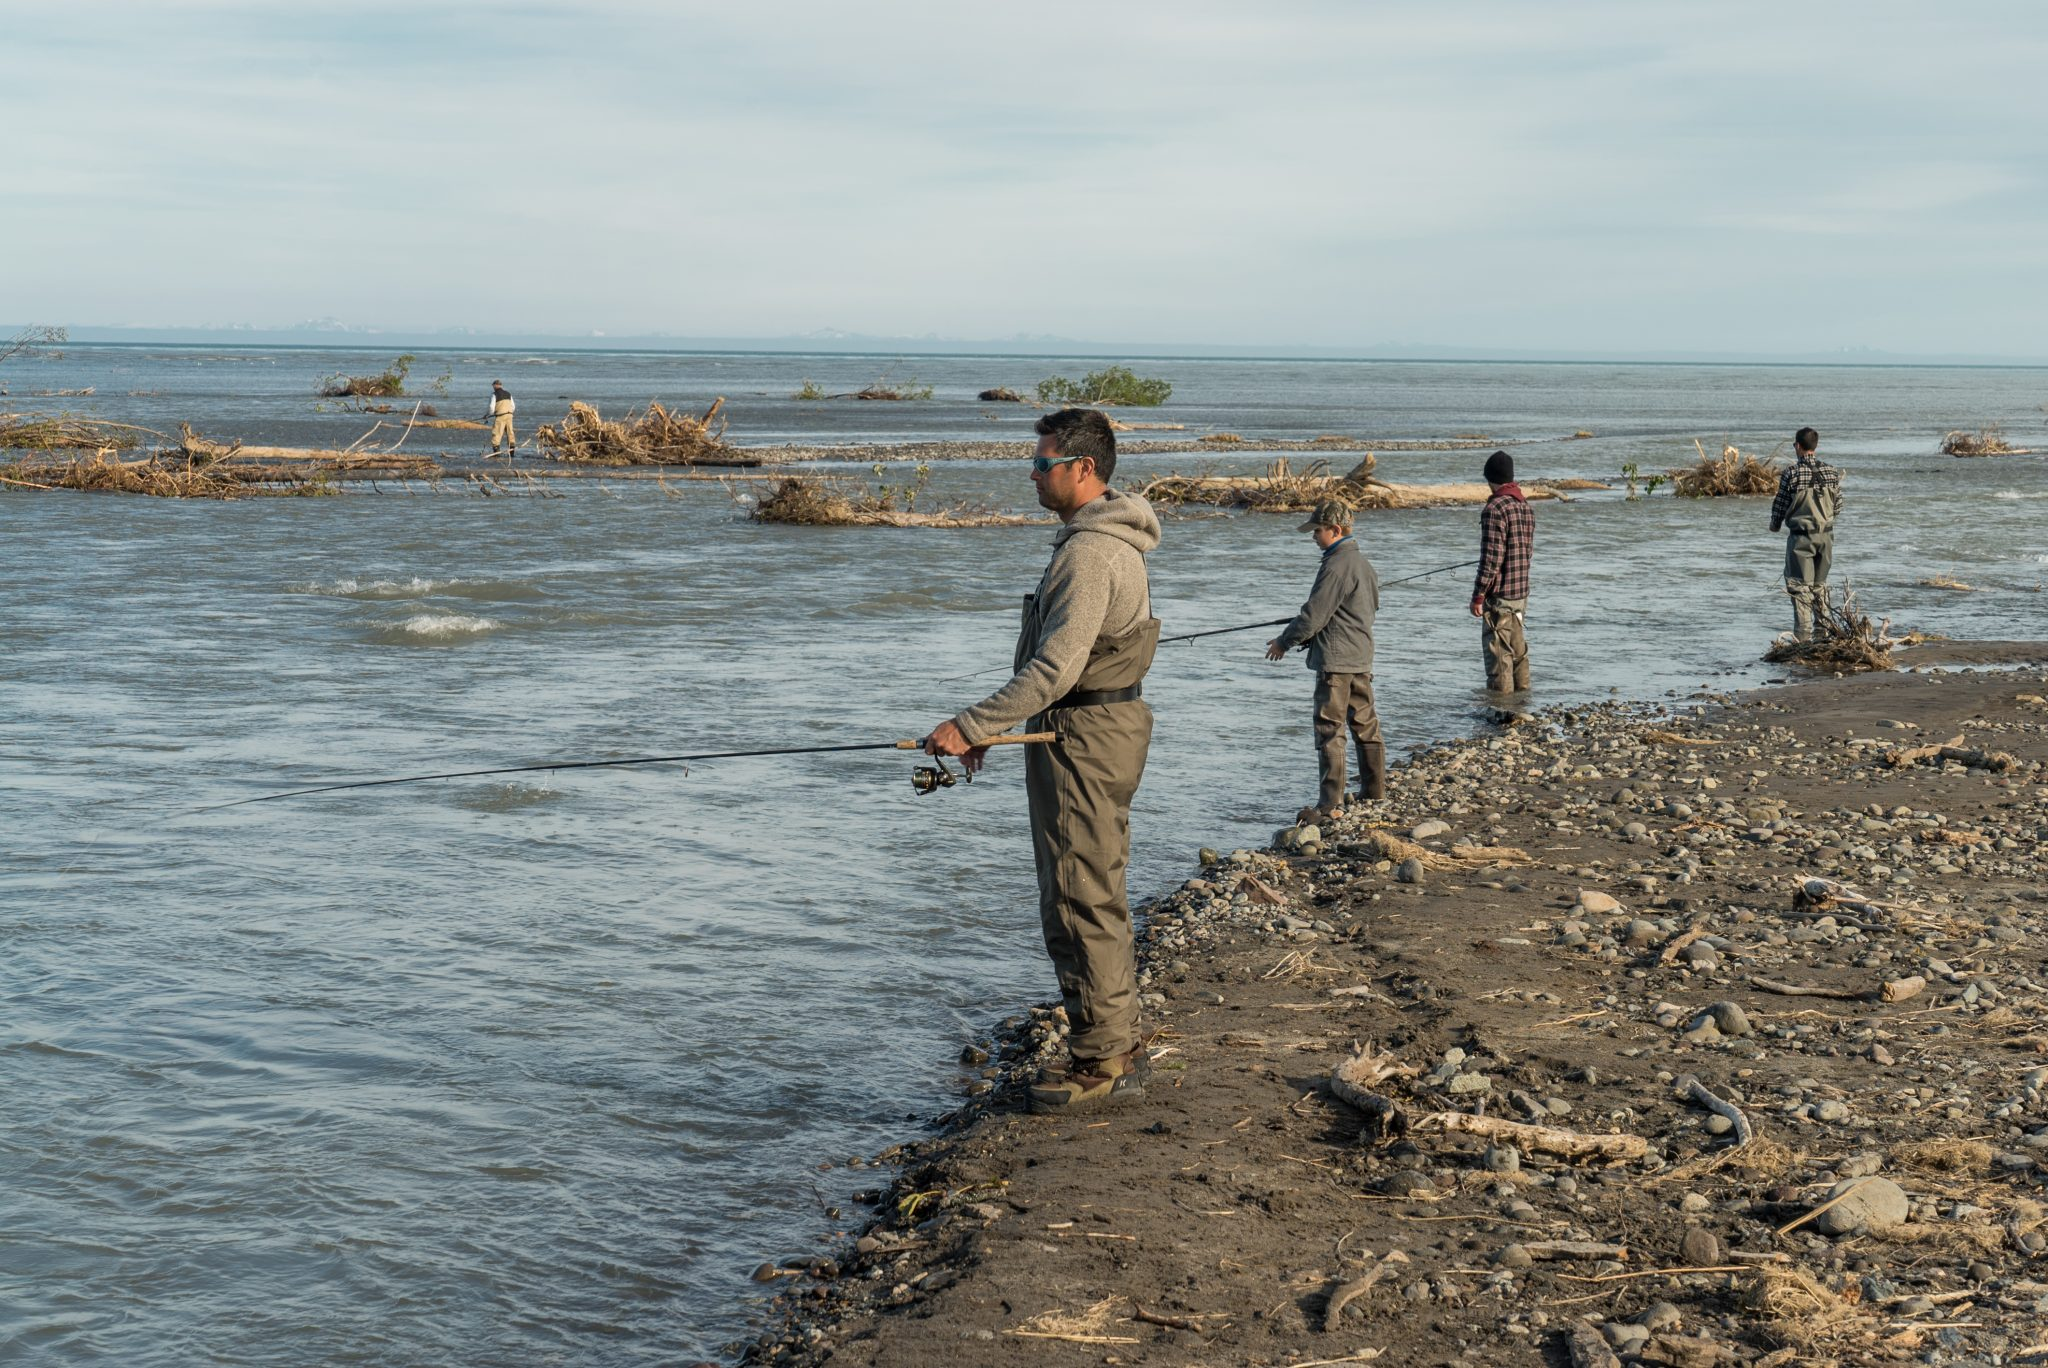 alaska-crescent-river-vacation-fishing-salmon-snug-harbor-DSC06856